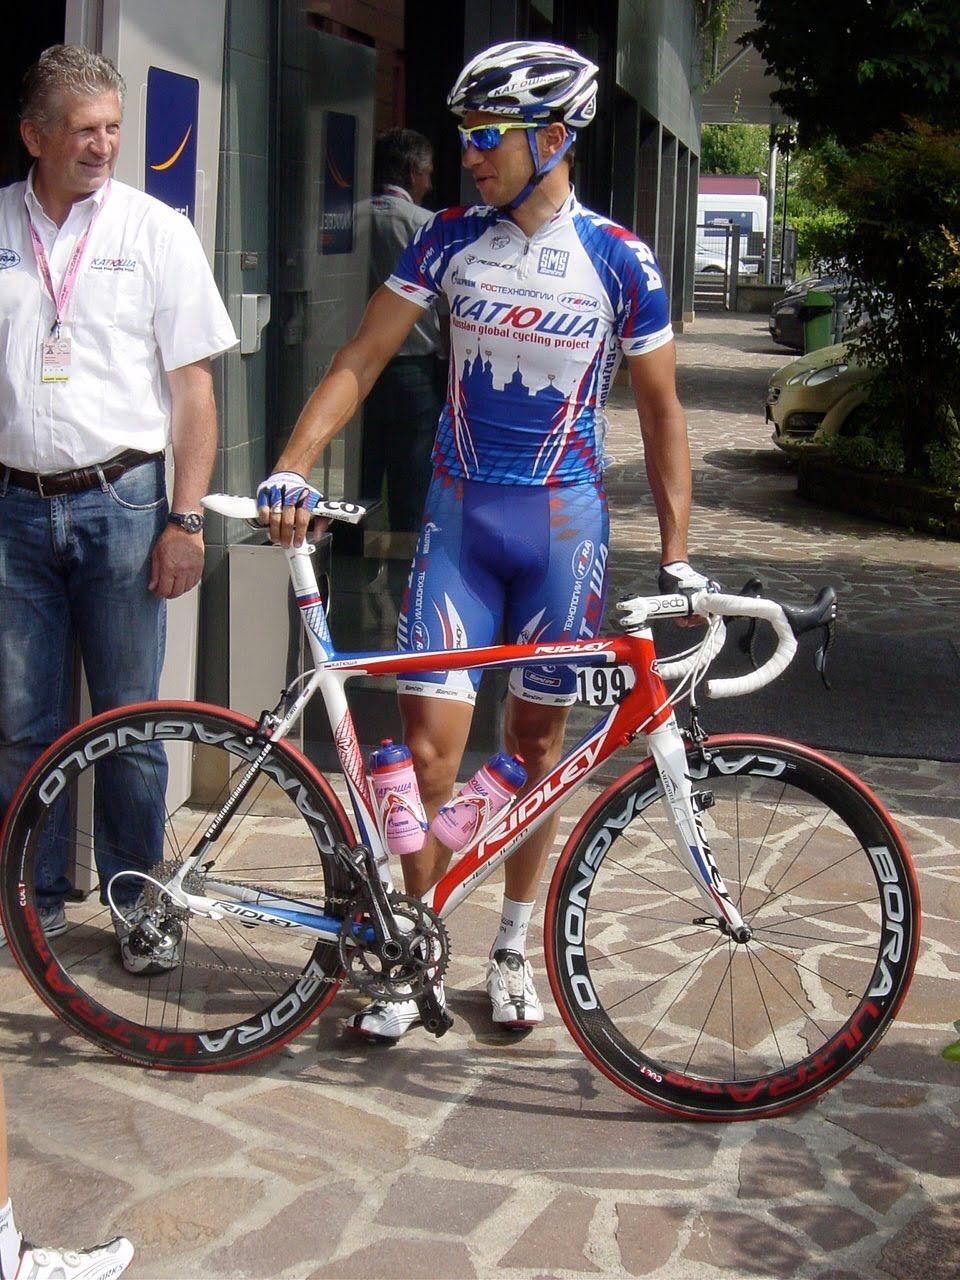 ridley mc ewen - Google zoeken Cycling Wear fd5b72cf1